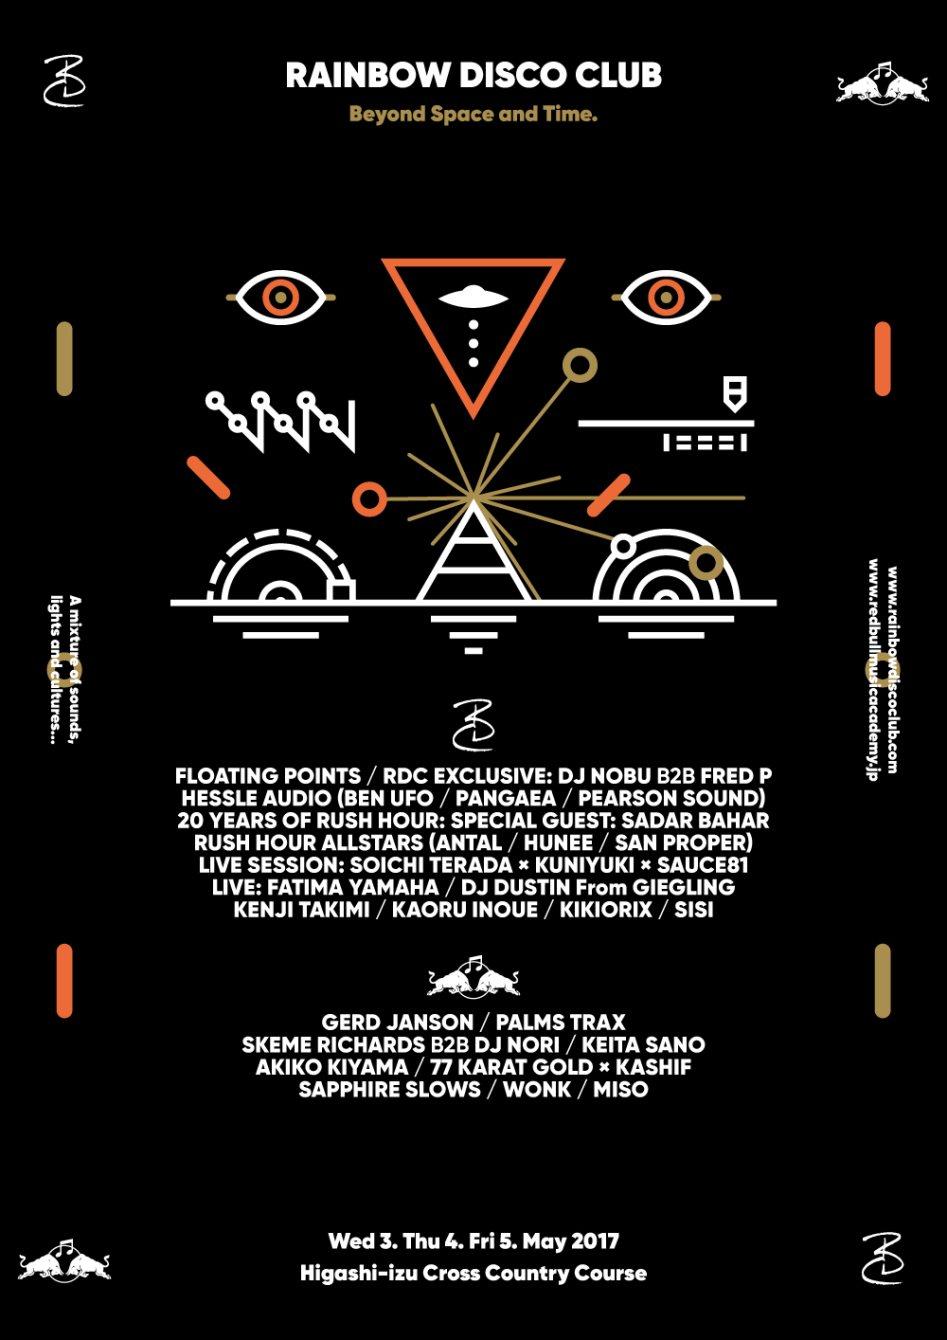 Rainbow Disco Club 2017 - Flyer front